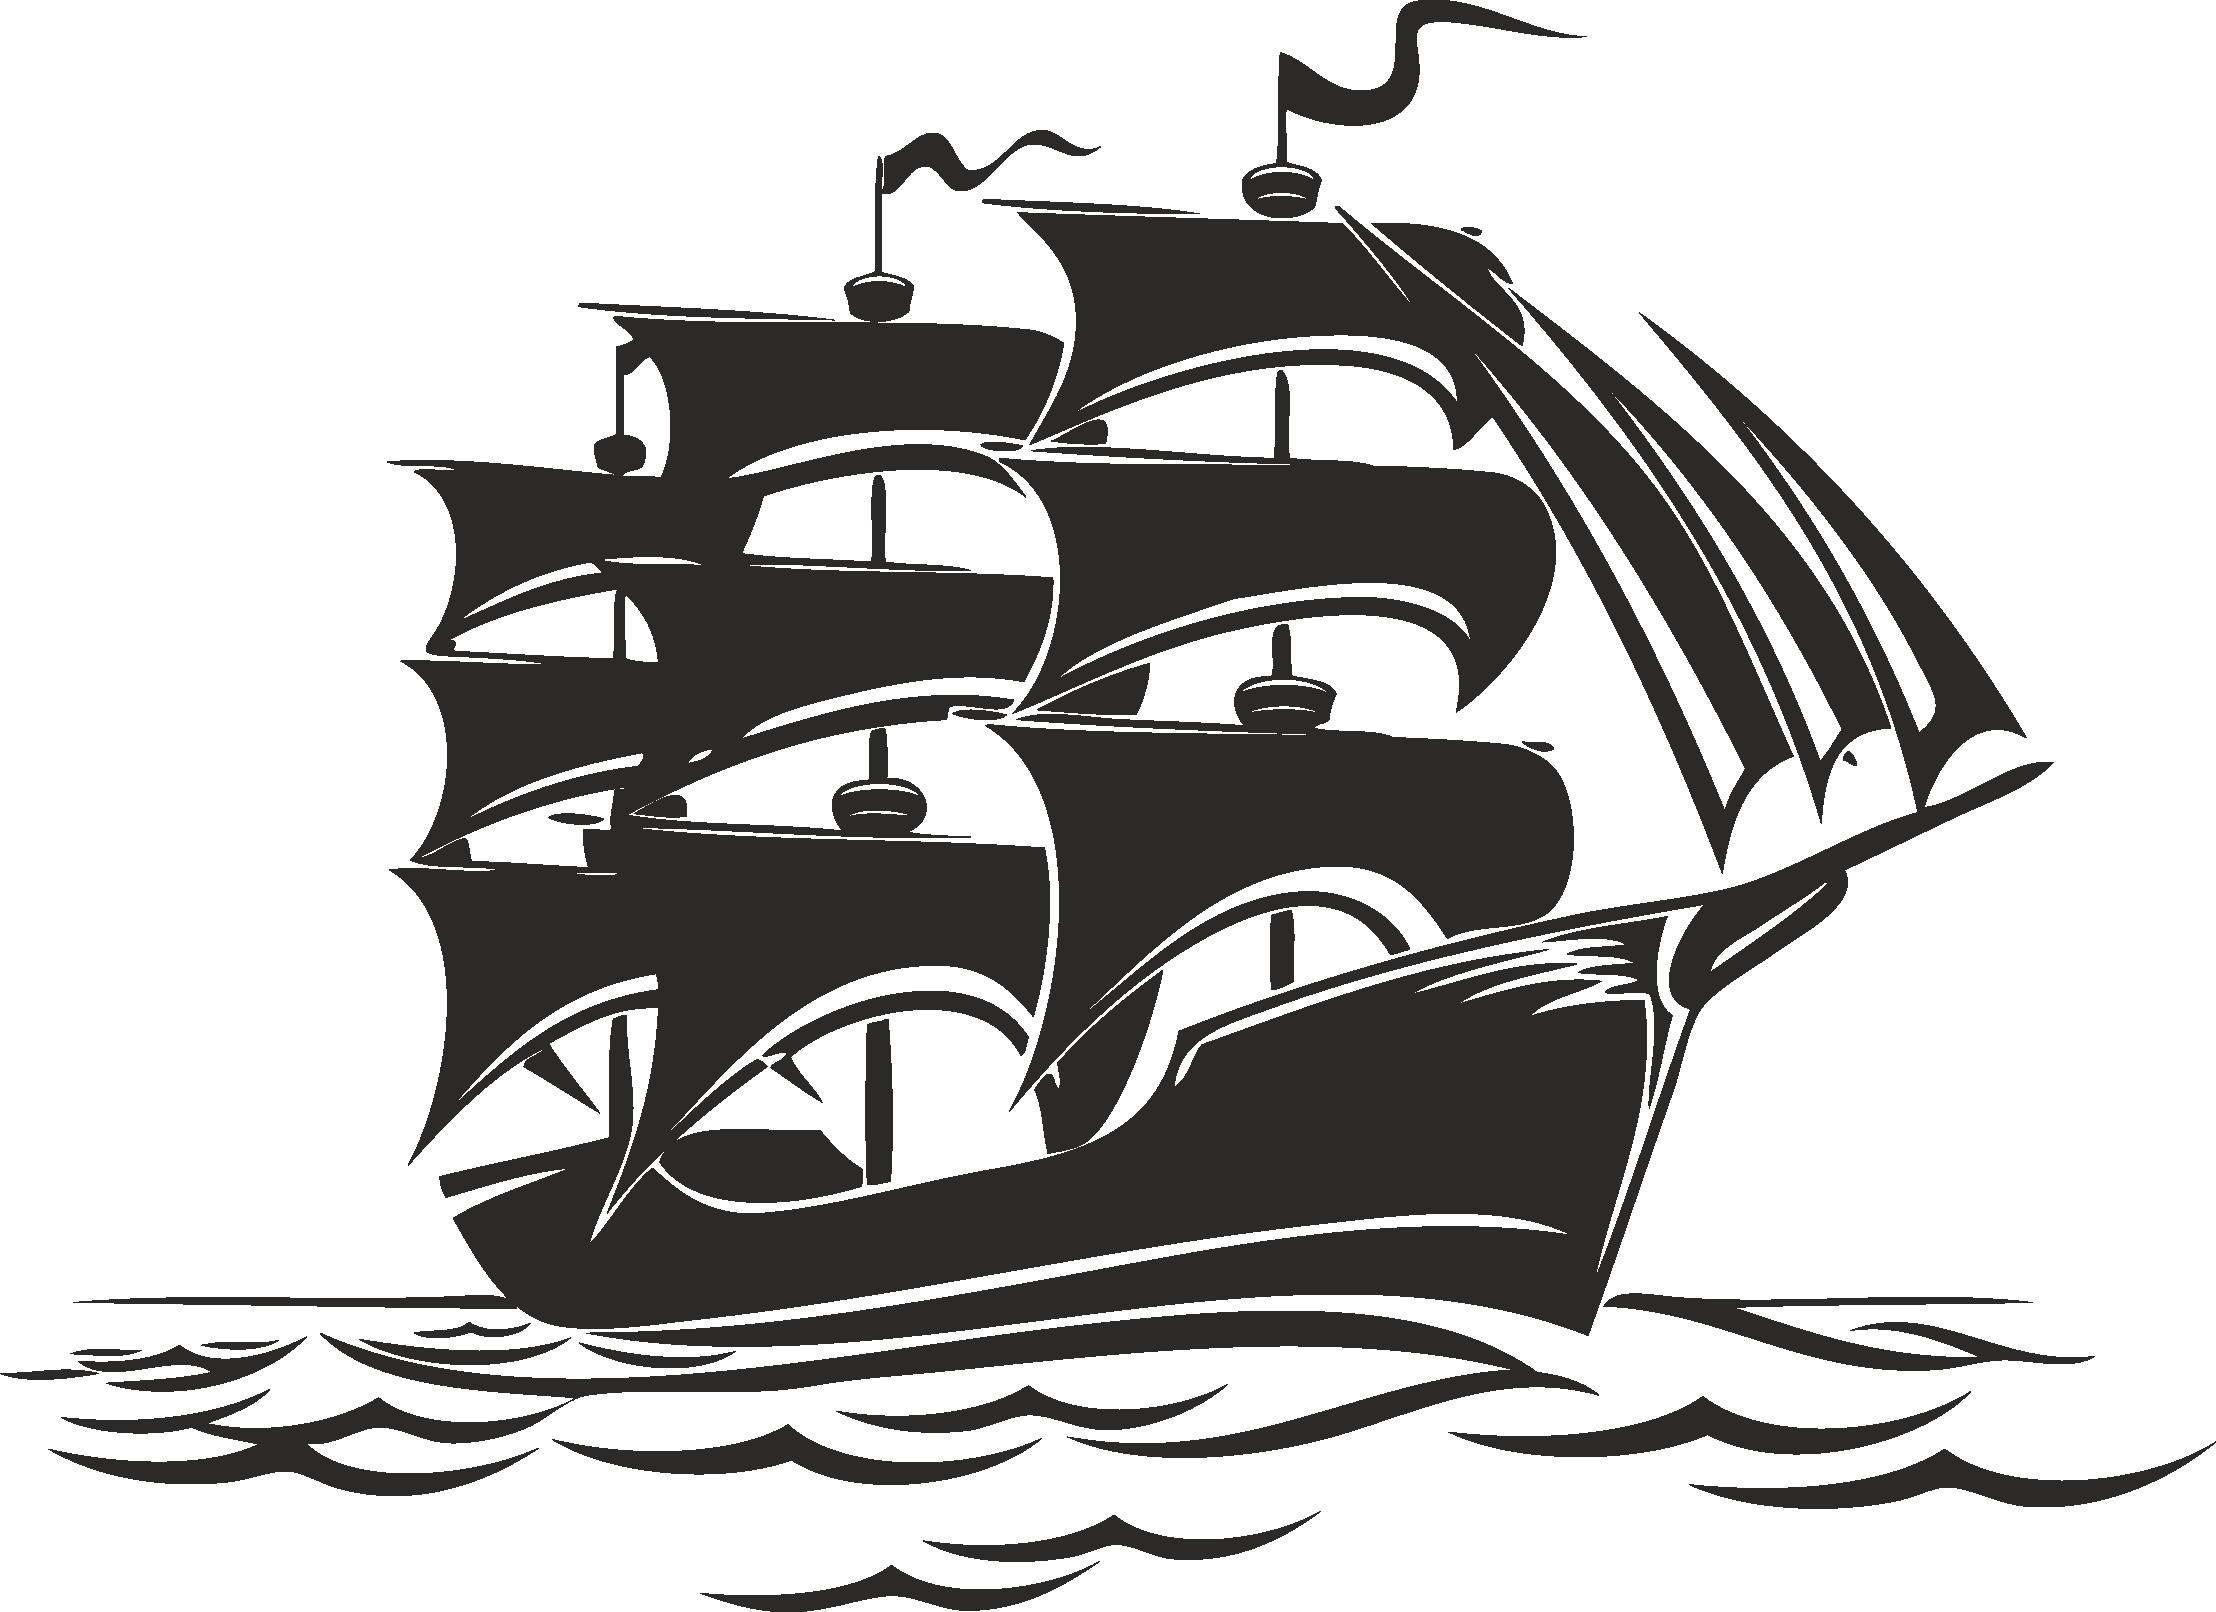 Sailboat Beautiful Silhouettes Of Sailing Ships 07 Free DXF File